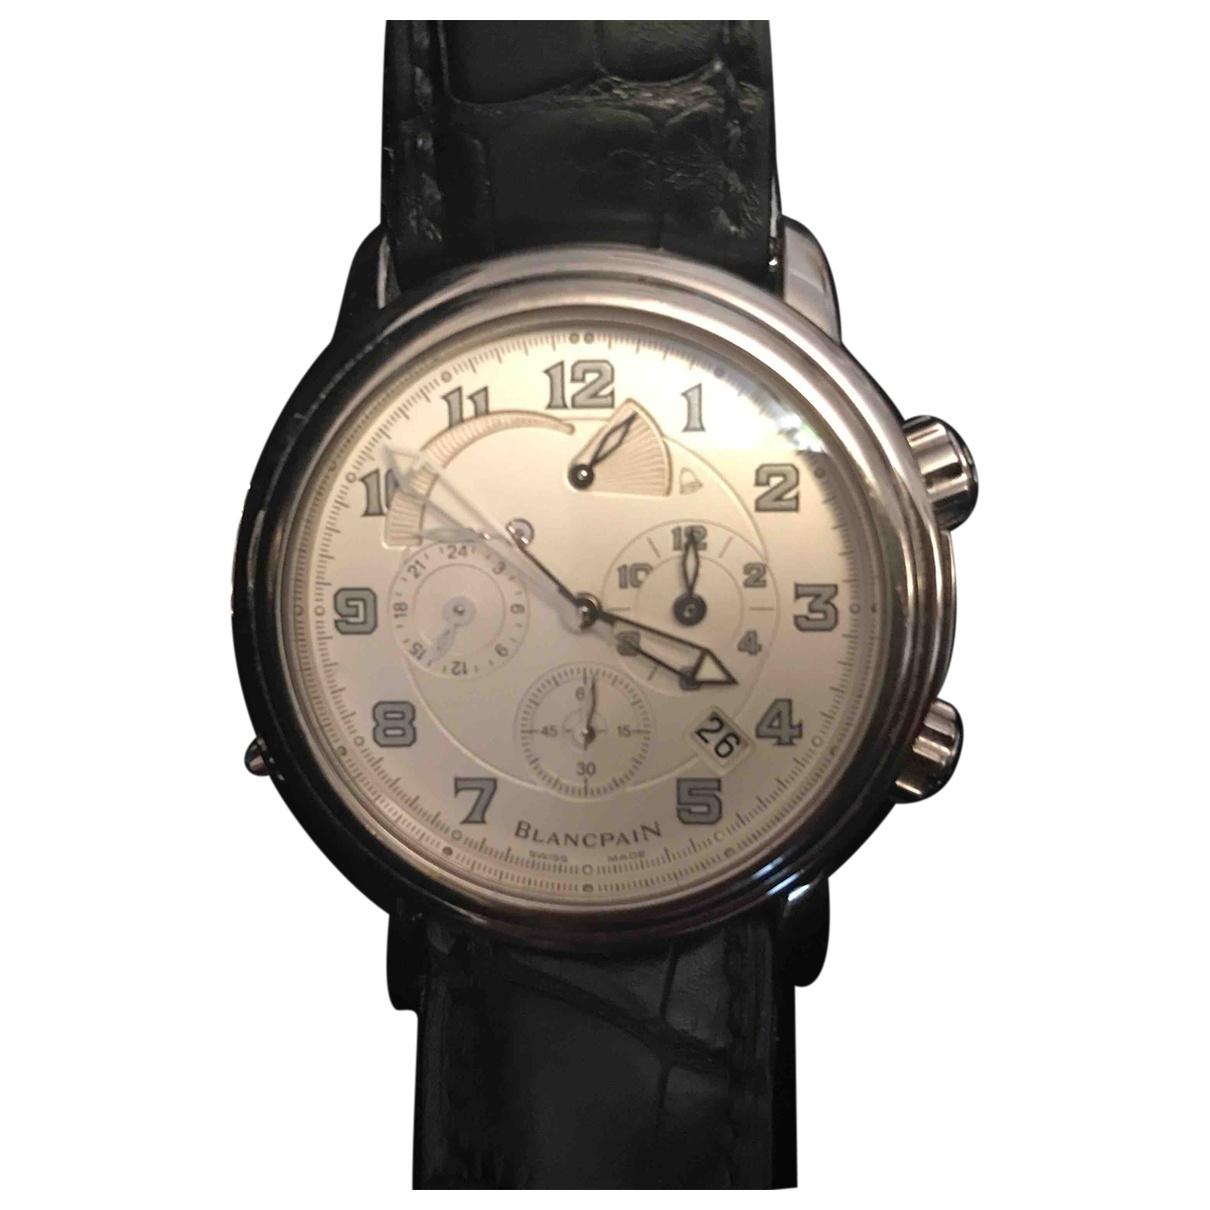 Blancpain \N Black White gold watch for Men \N